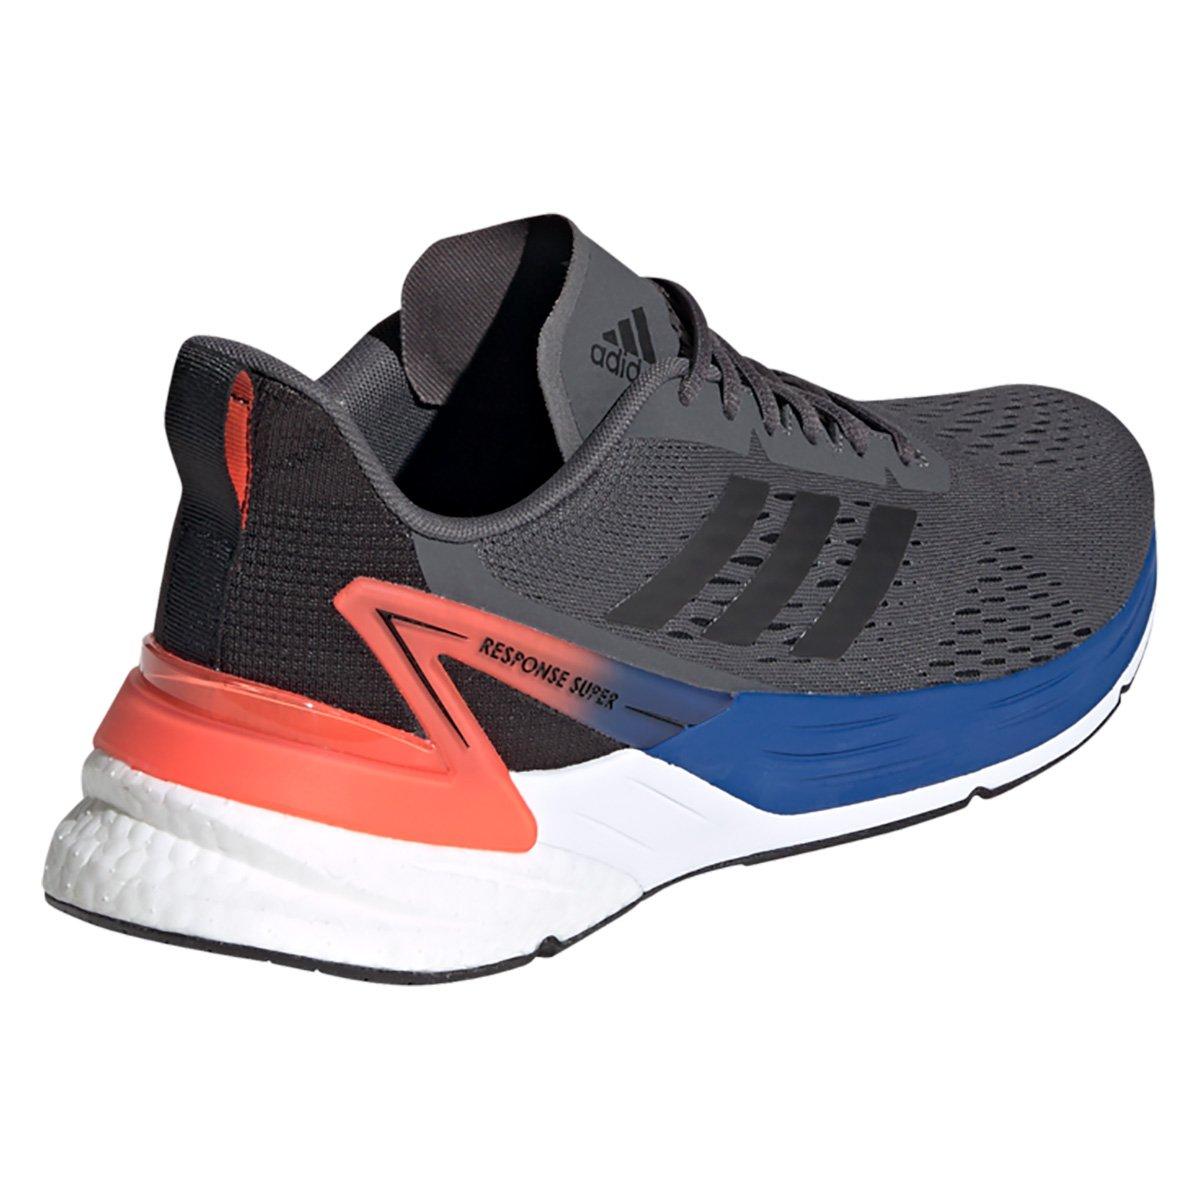 Tênis Adidas Response Super Boost Masculino - Cinza e